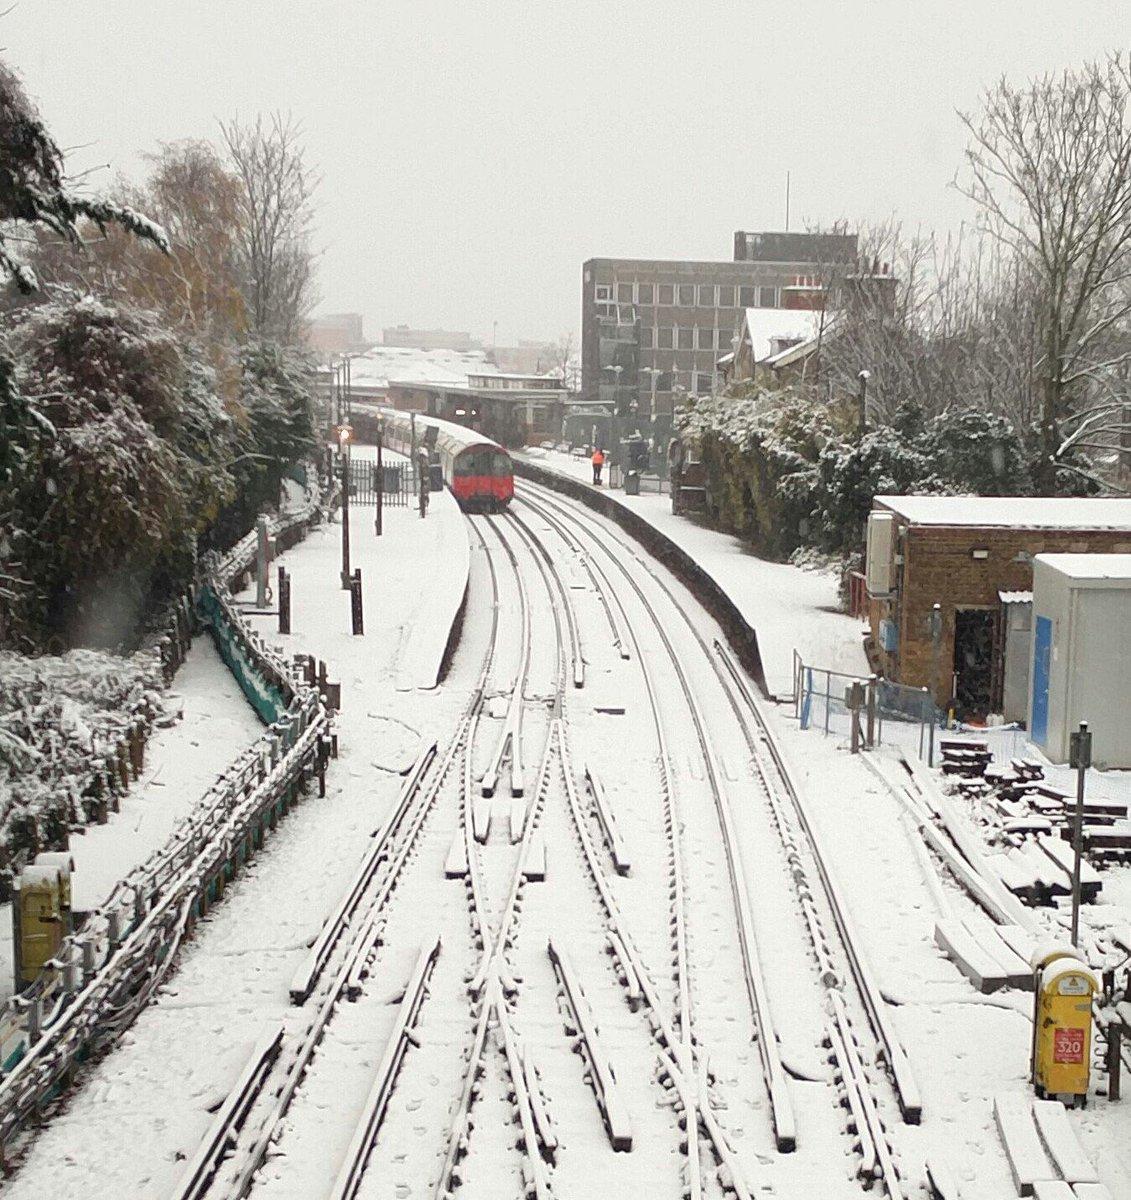 RT @Nagasawa_I: ロンドンの地下鉄が雪で止まってる、、、イギリスも雪降ってるのか〜🇬🇧 https://t.co/lvKyMCSatz